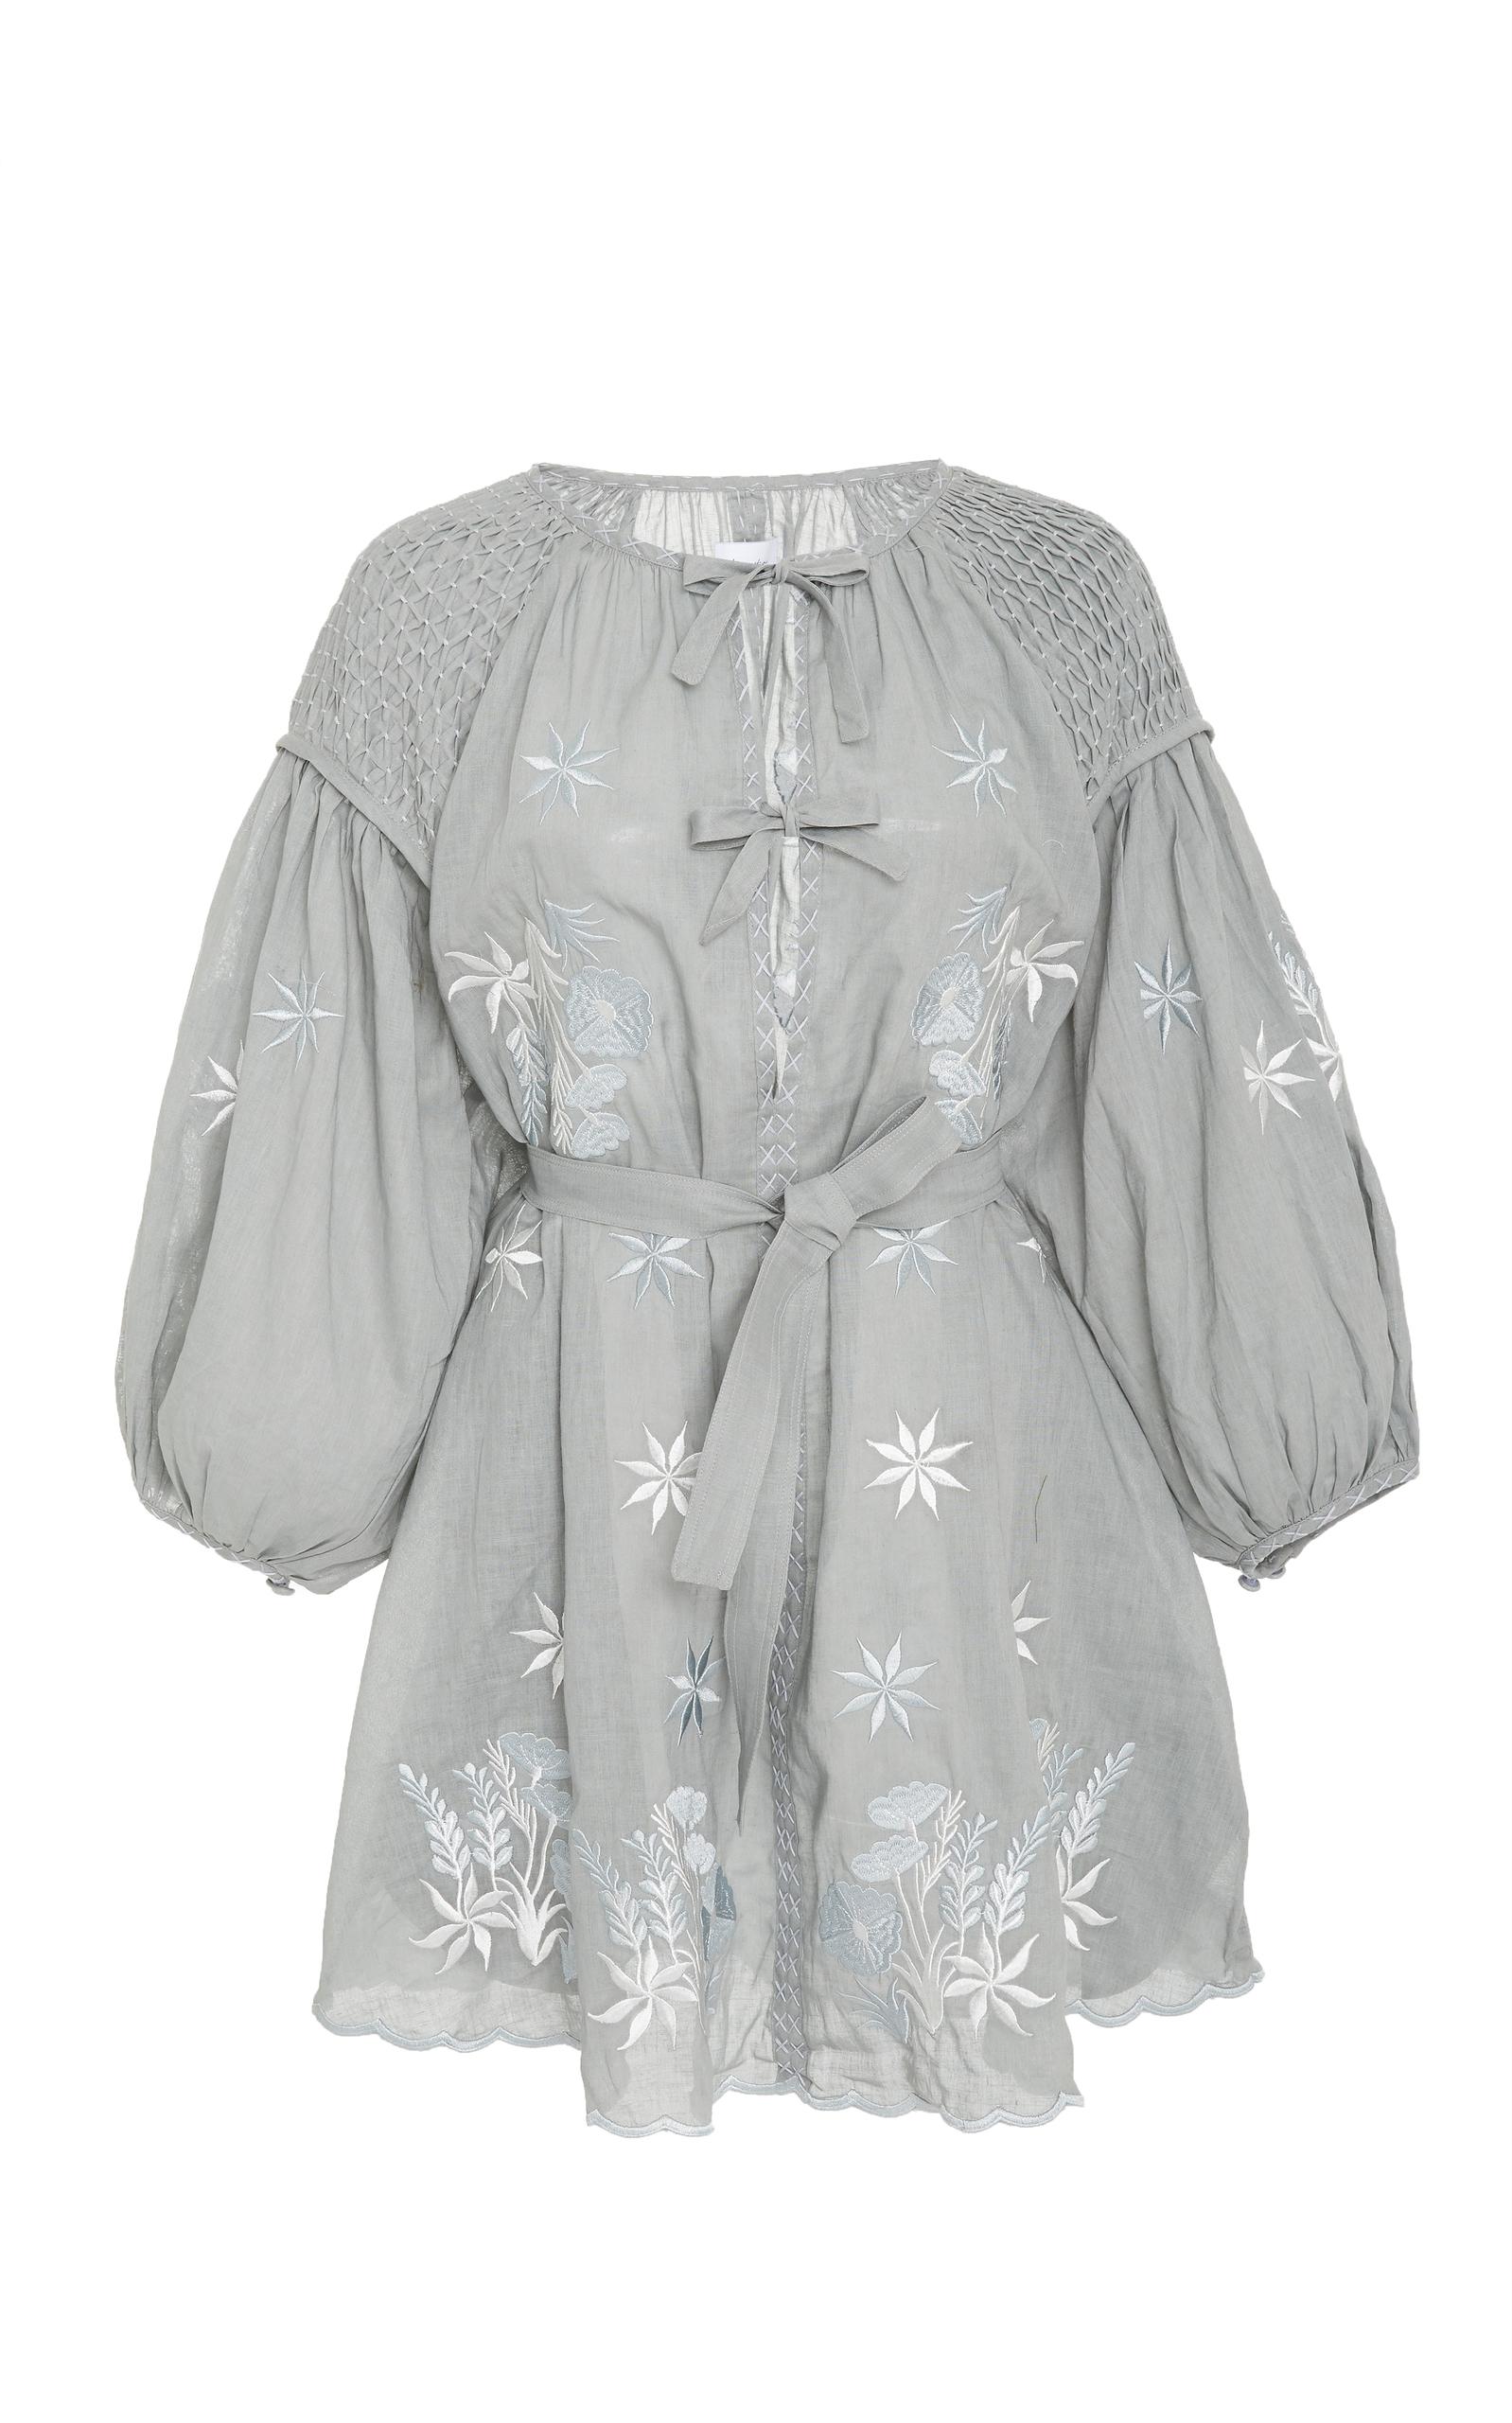 INNIKA CHOO FLARED SMOCK MINI DRESS